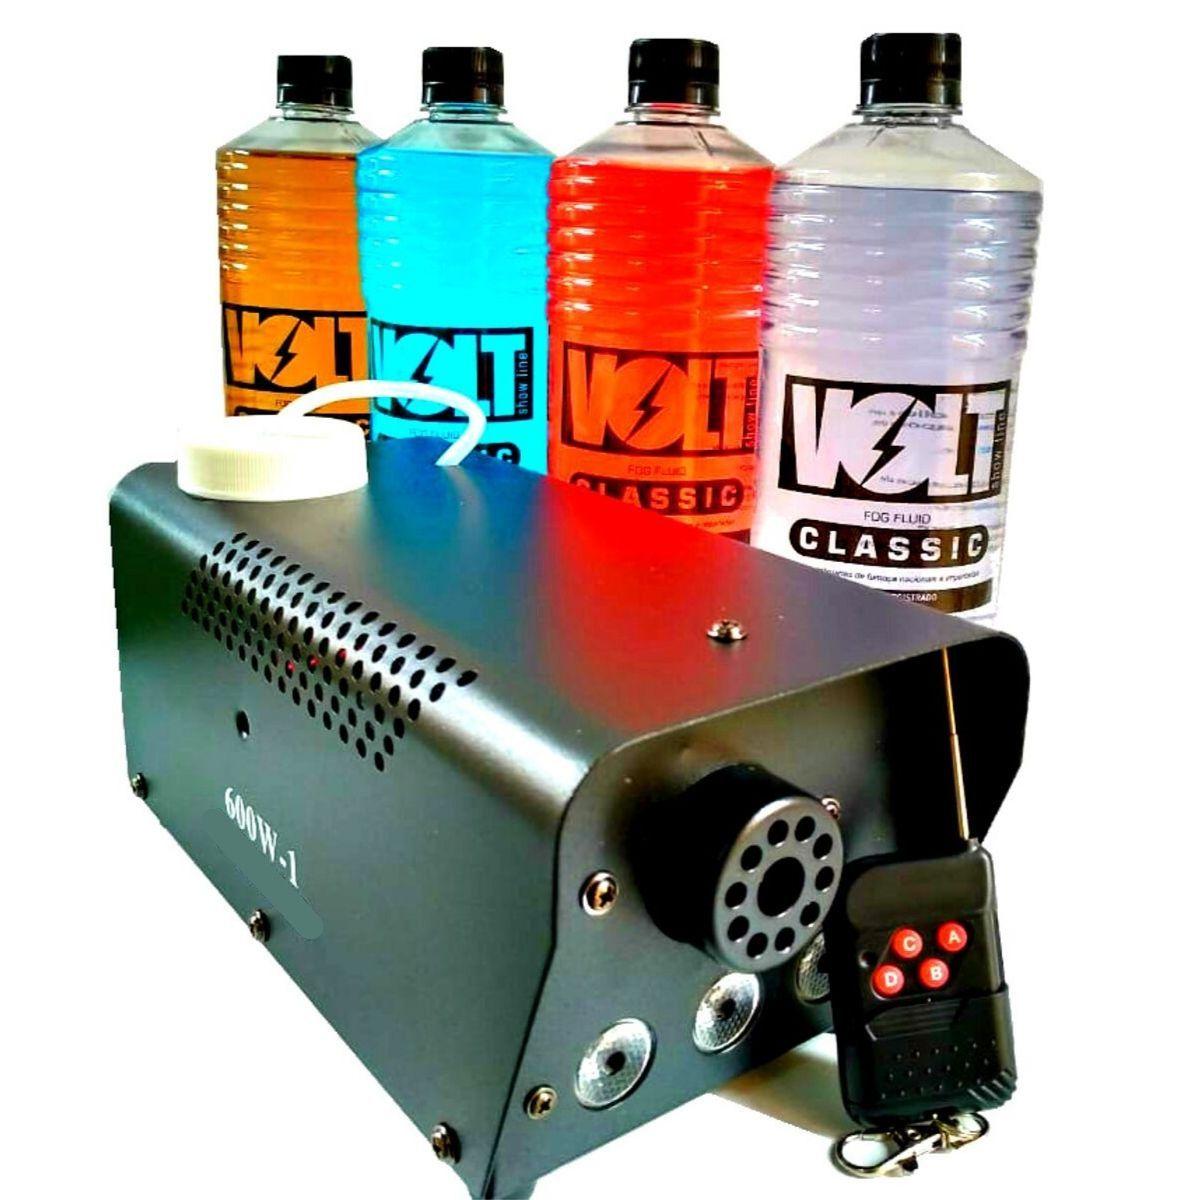 Kit Máquina de Fumaça 600W 3 Leds + 2 Litros de Líquido - XH-600W+MY1012